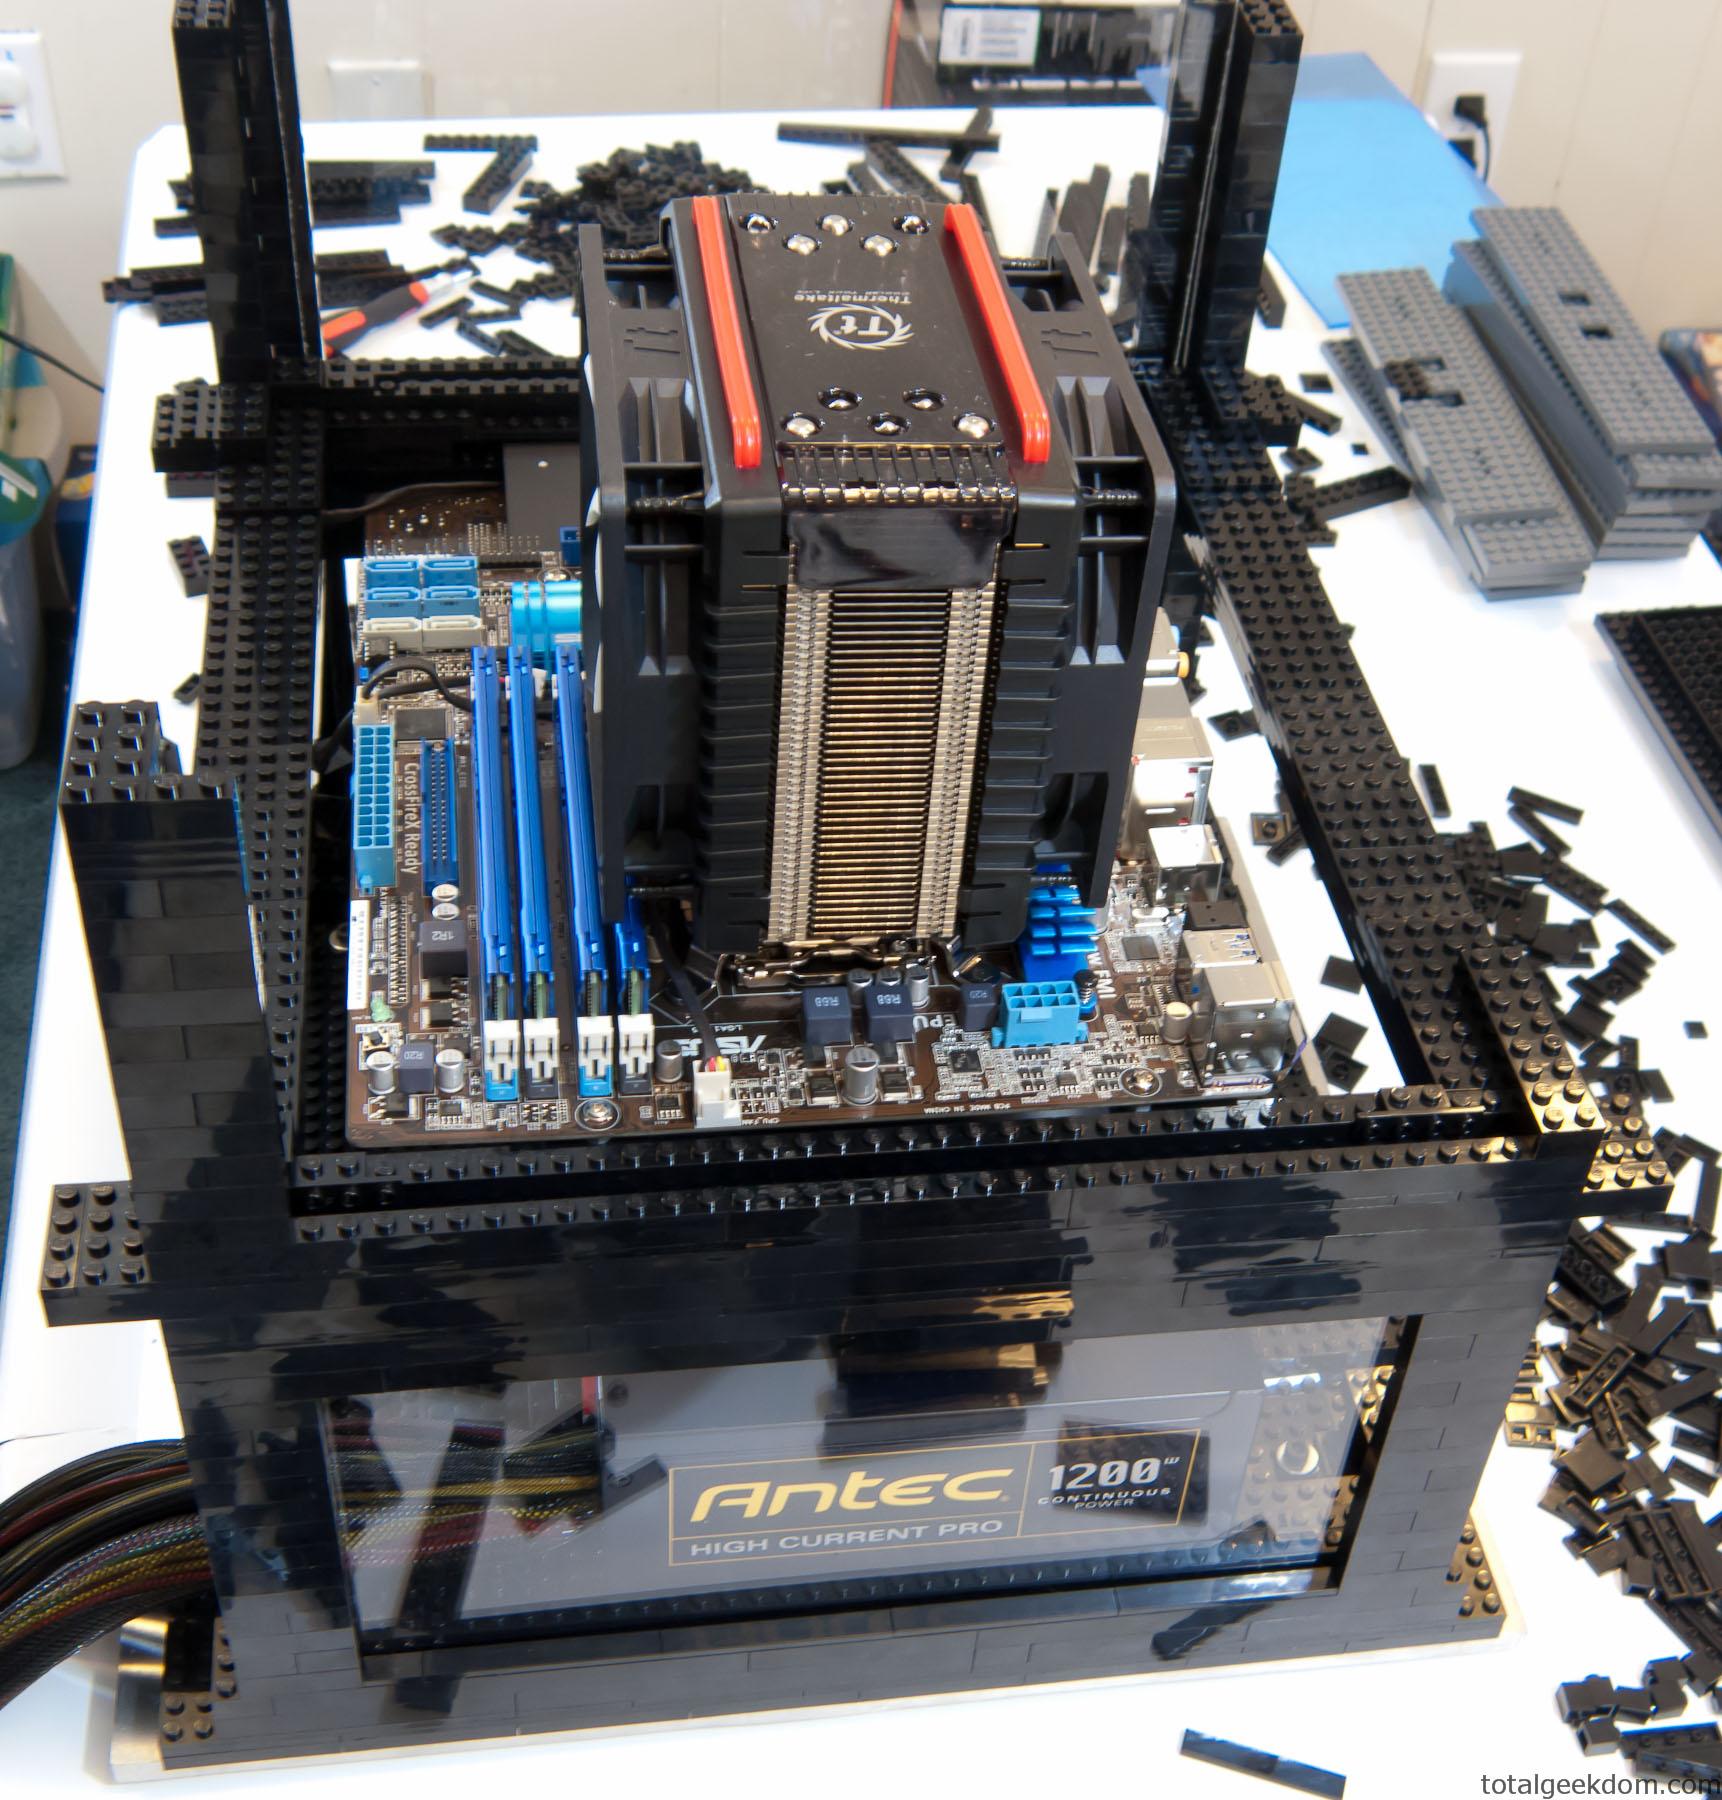 Lego Computer & Folding Farm